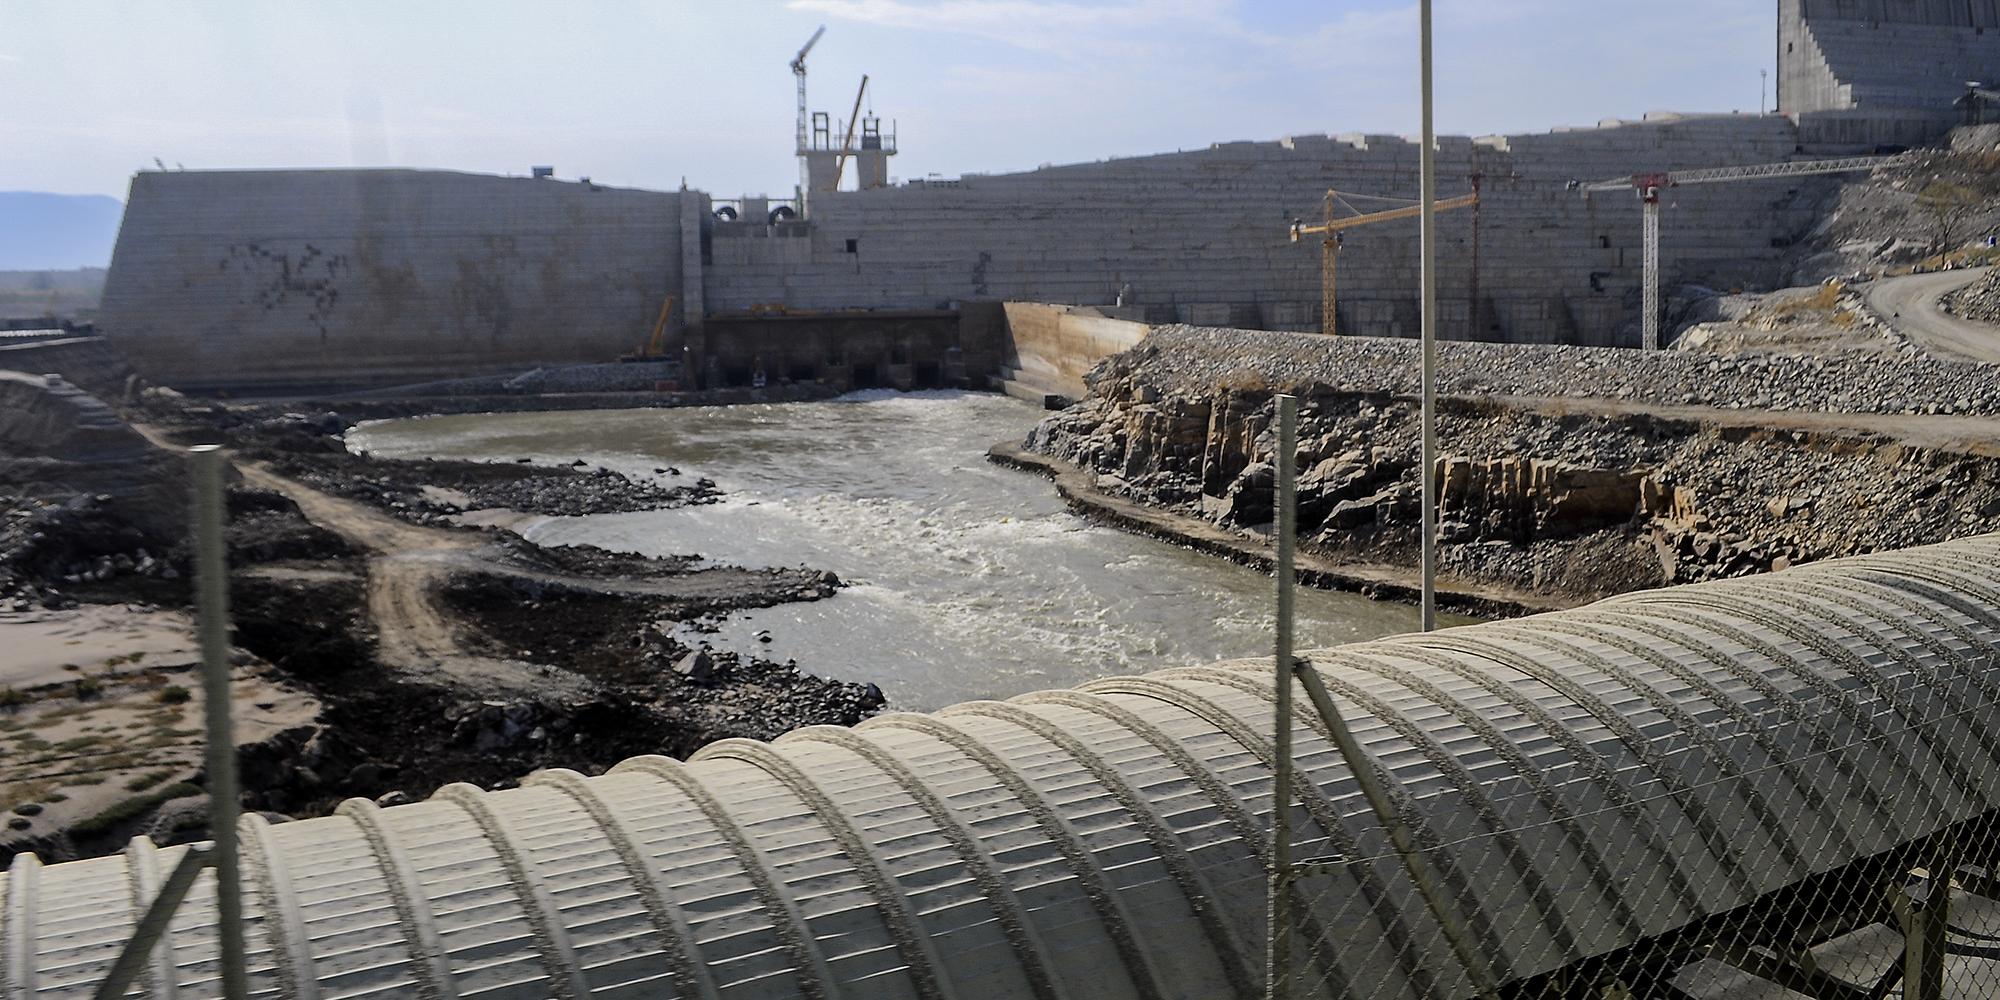 OP-ED: Grand Ethiopian Renaissance Dam: AU intervention is a good start, but a long road lies ahead